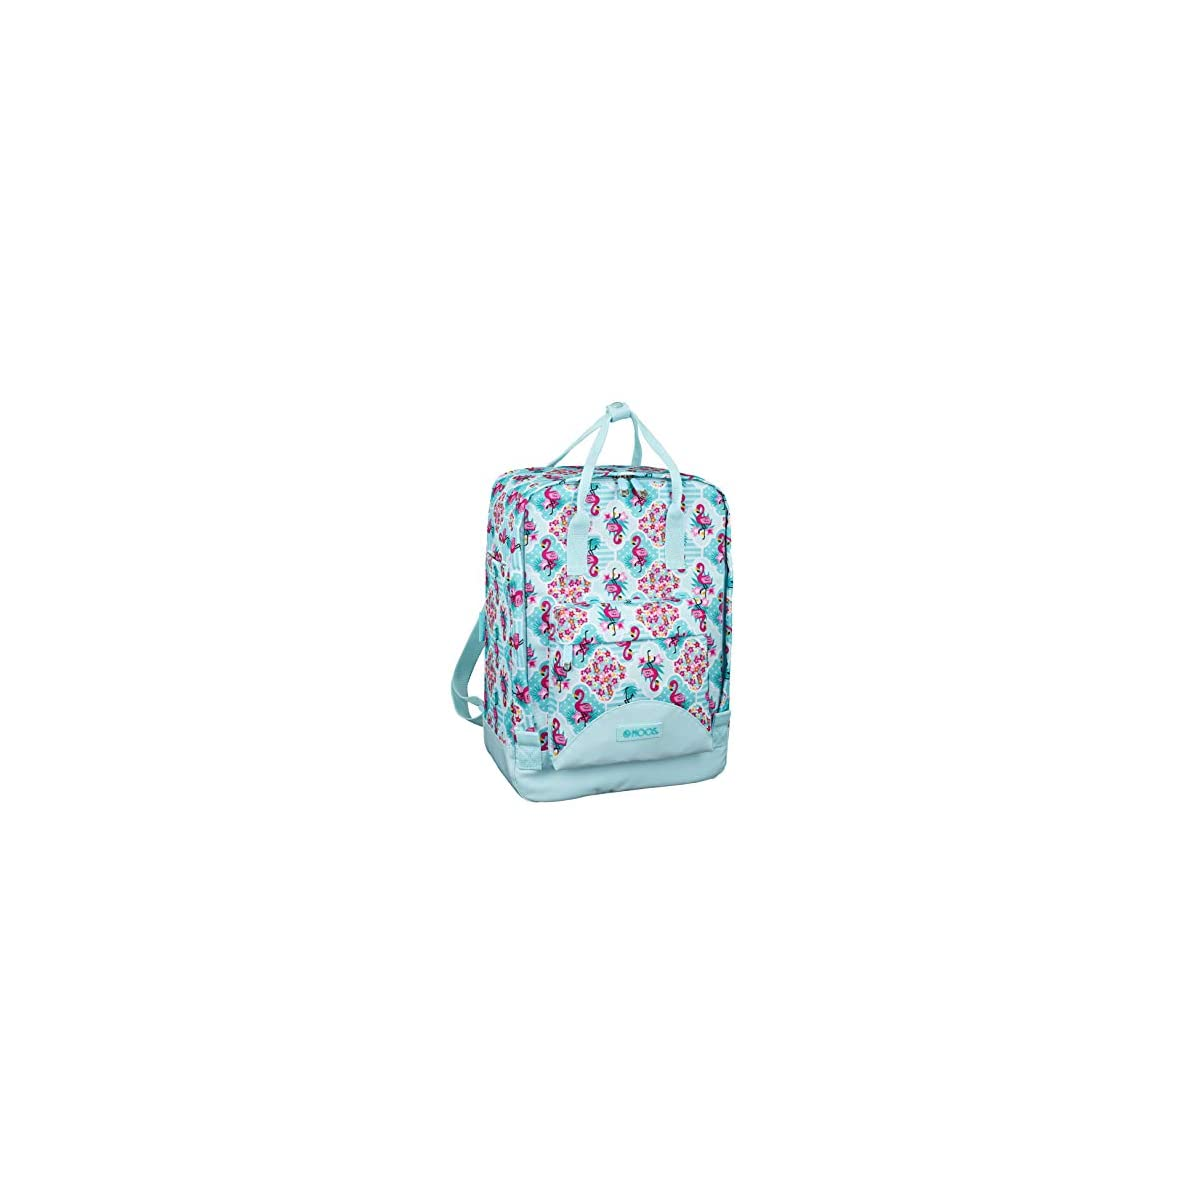 51%2B1UMPVpdL. SS1200  - Moos  Flamingo Turquoise Oficial Mochila Con Asas, 270x130x380mm